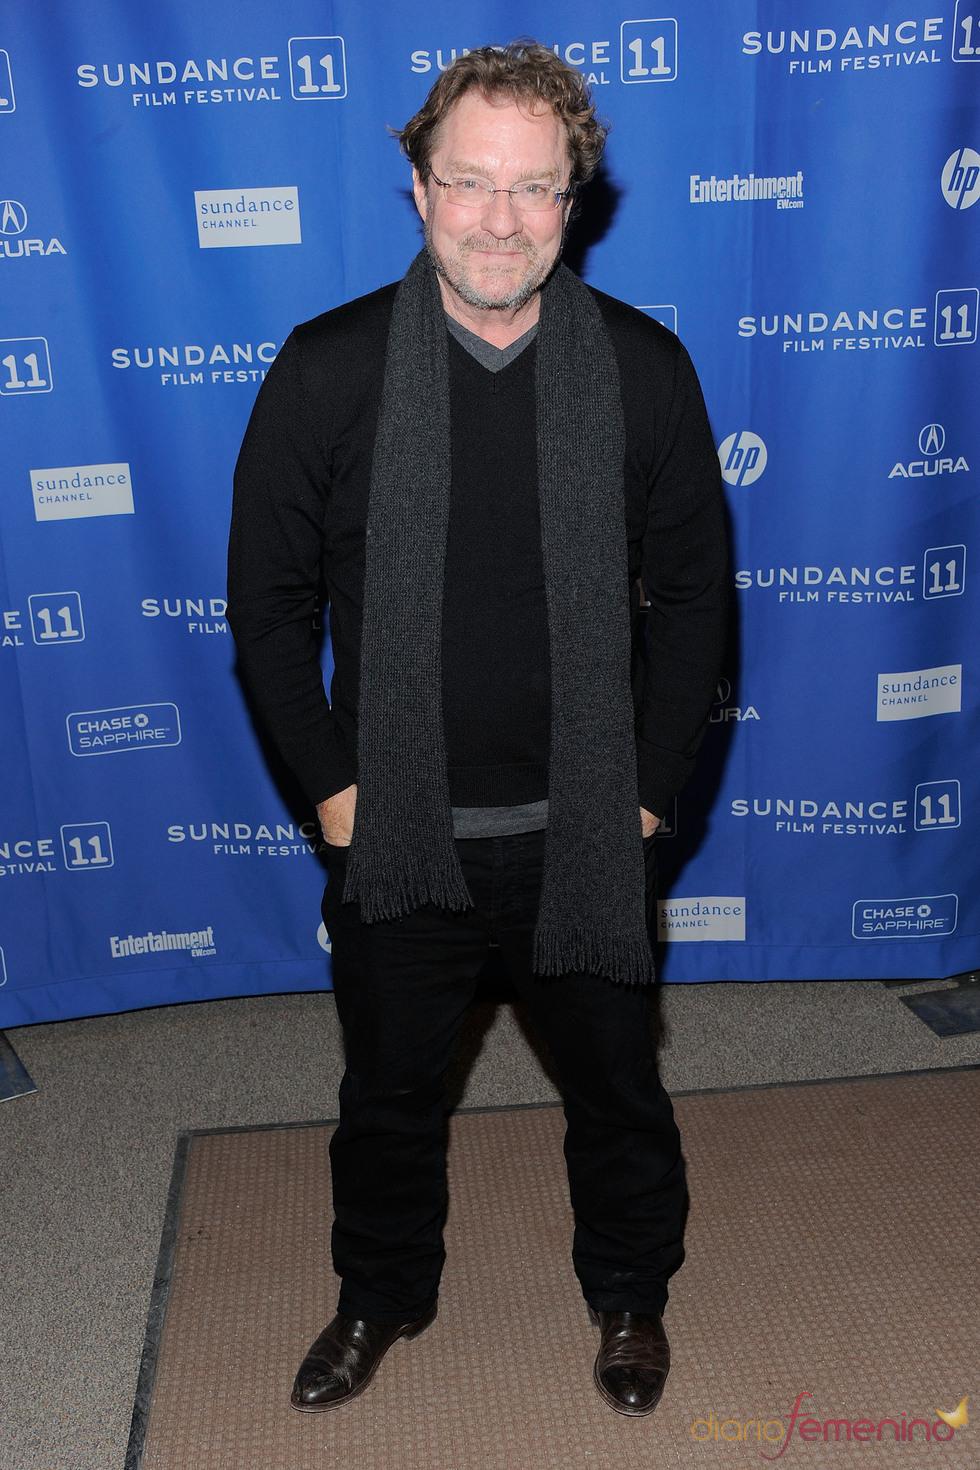 Stephen Root en el Festival de Cine Sundance 2011